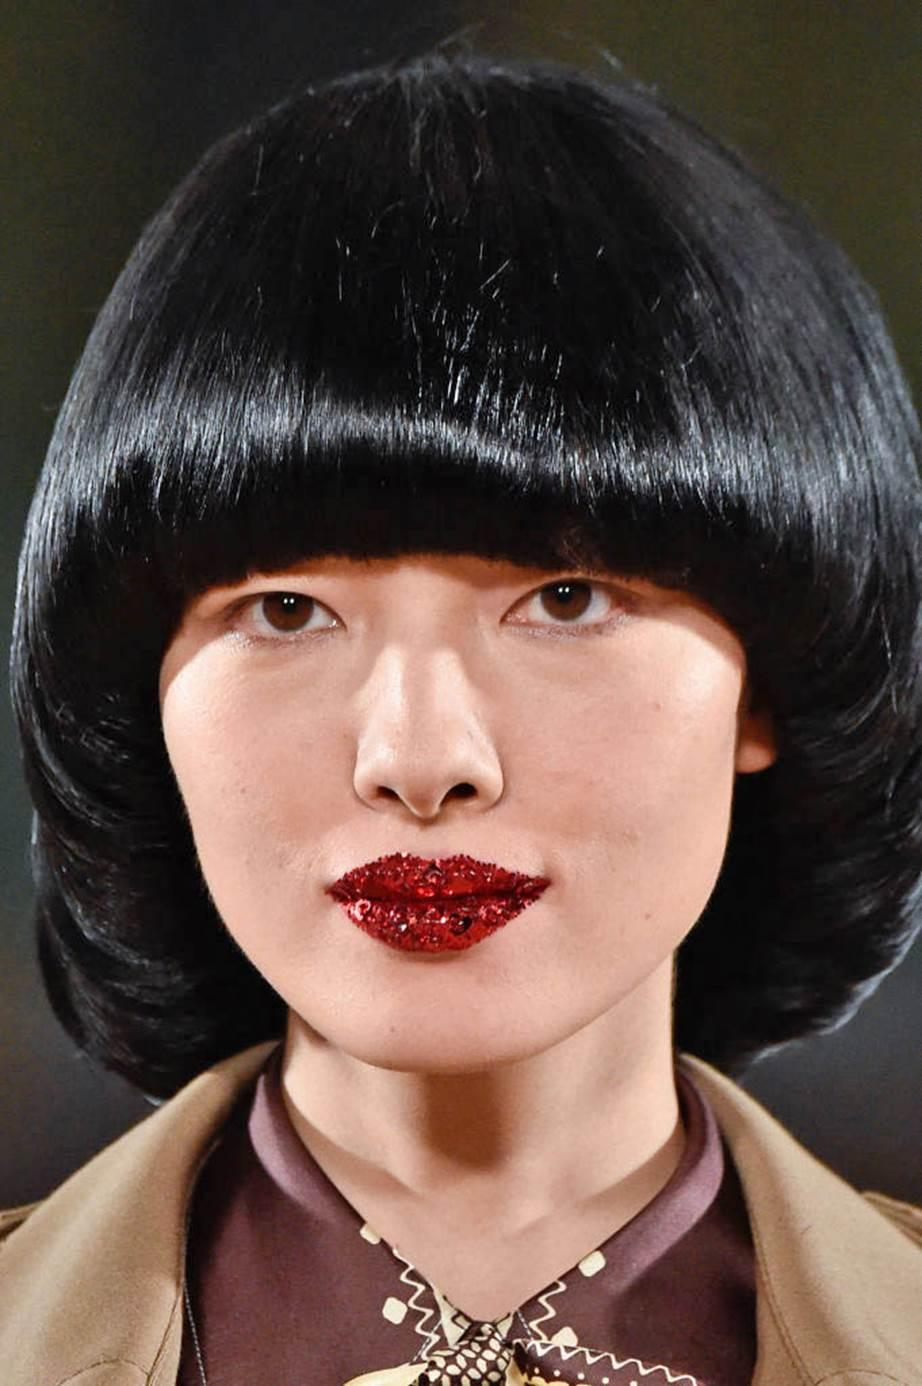 Datang dari tahun 60-an, model rambut wanita ini sangat unik